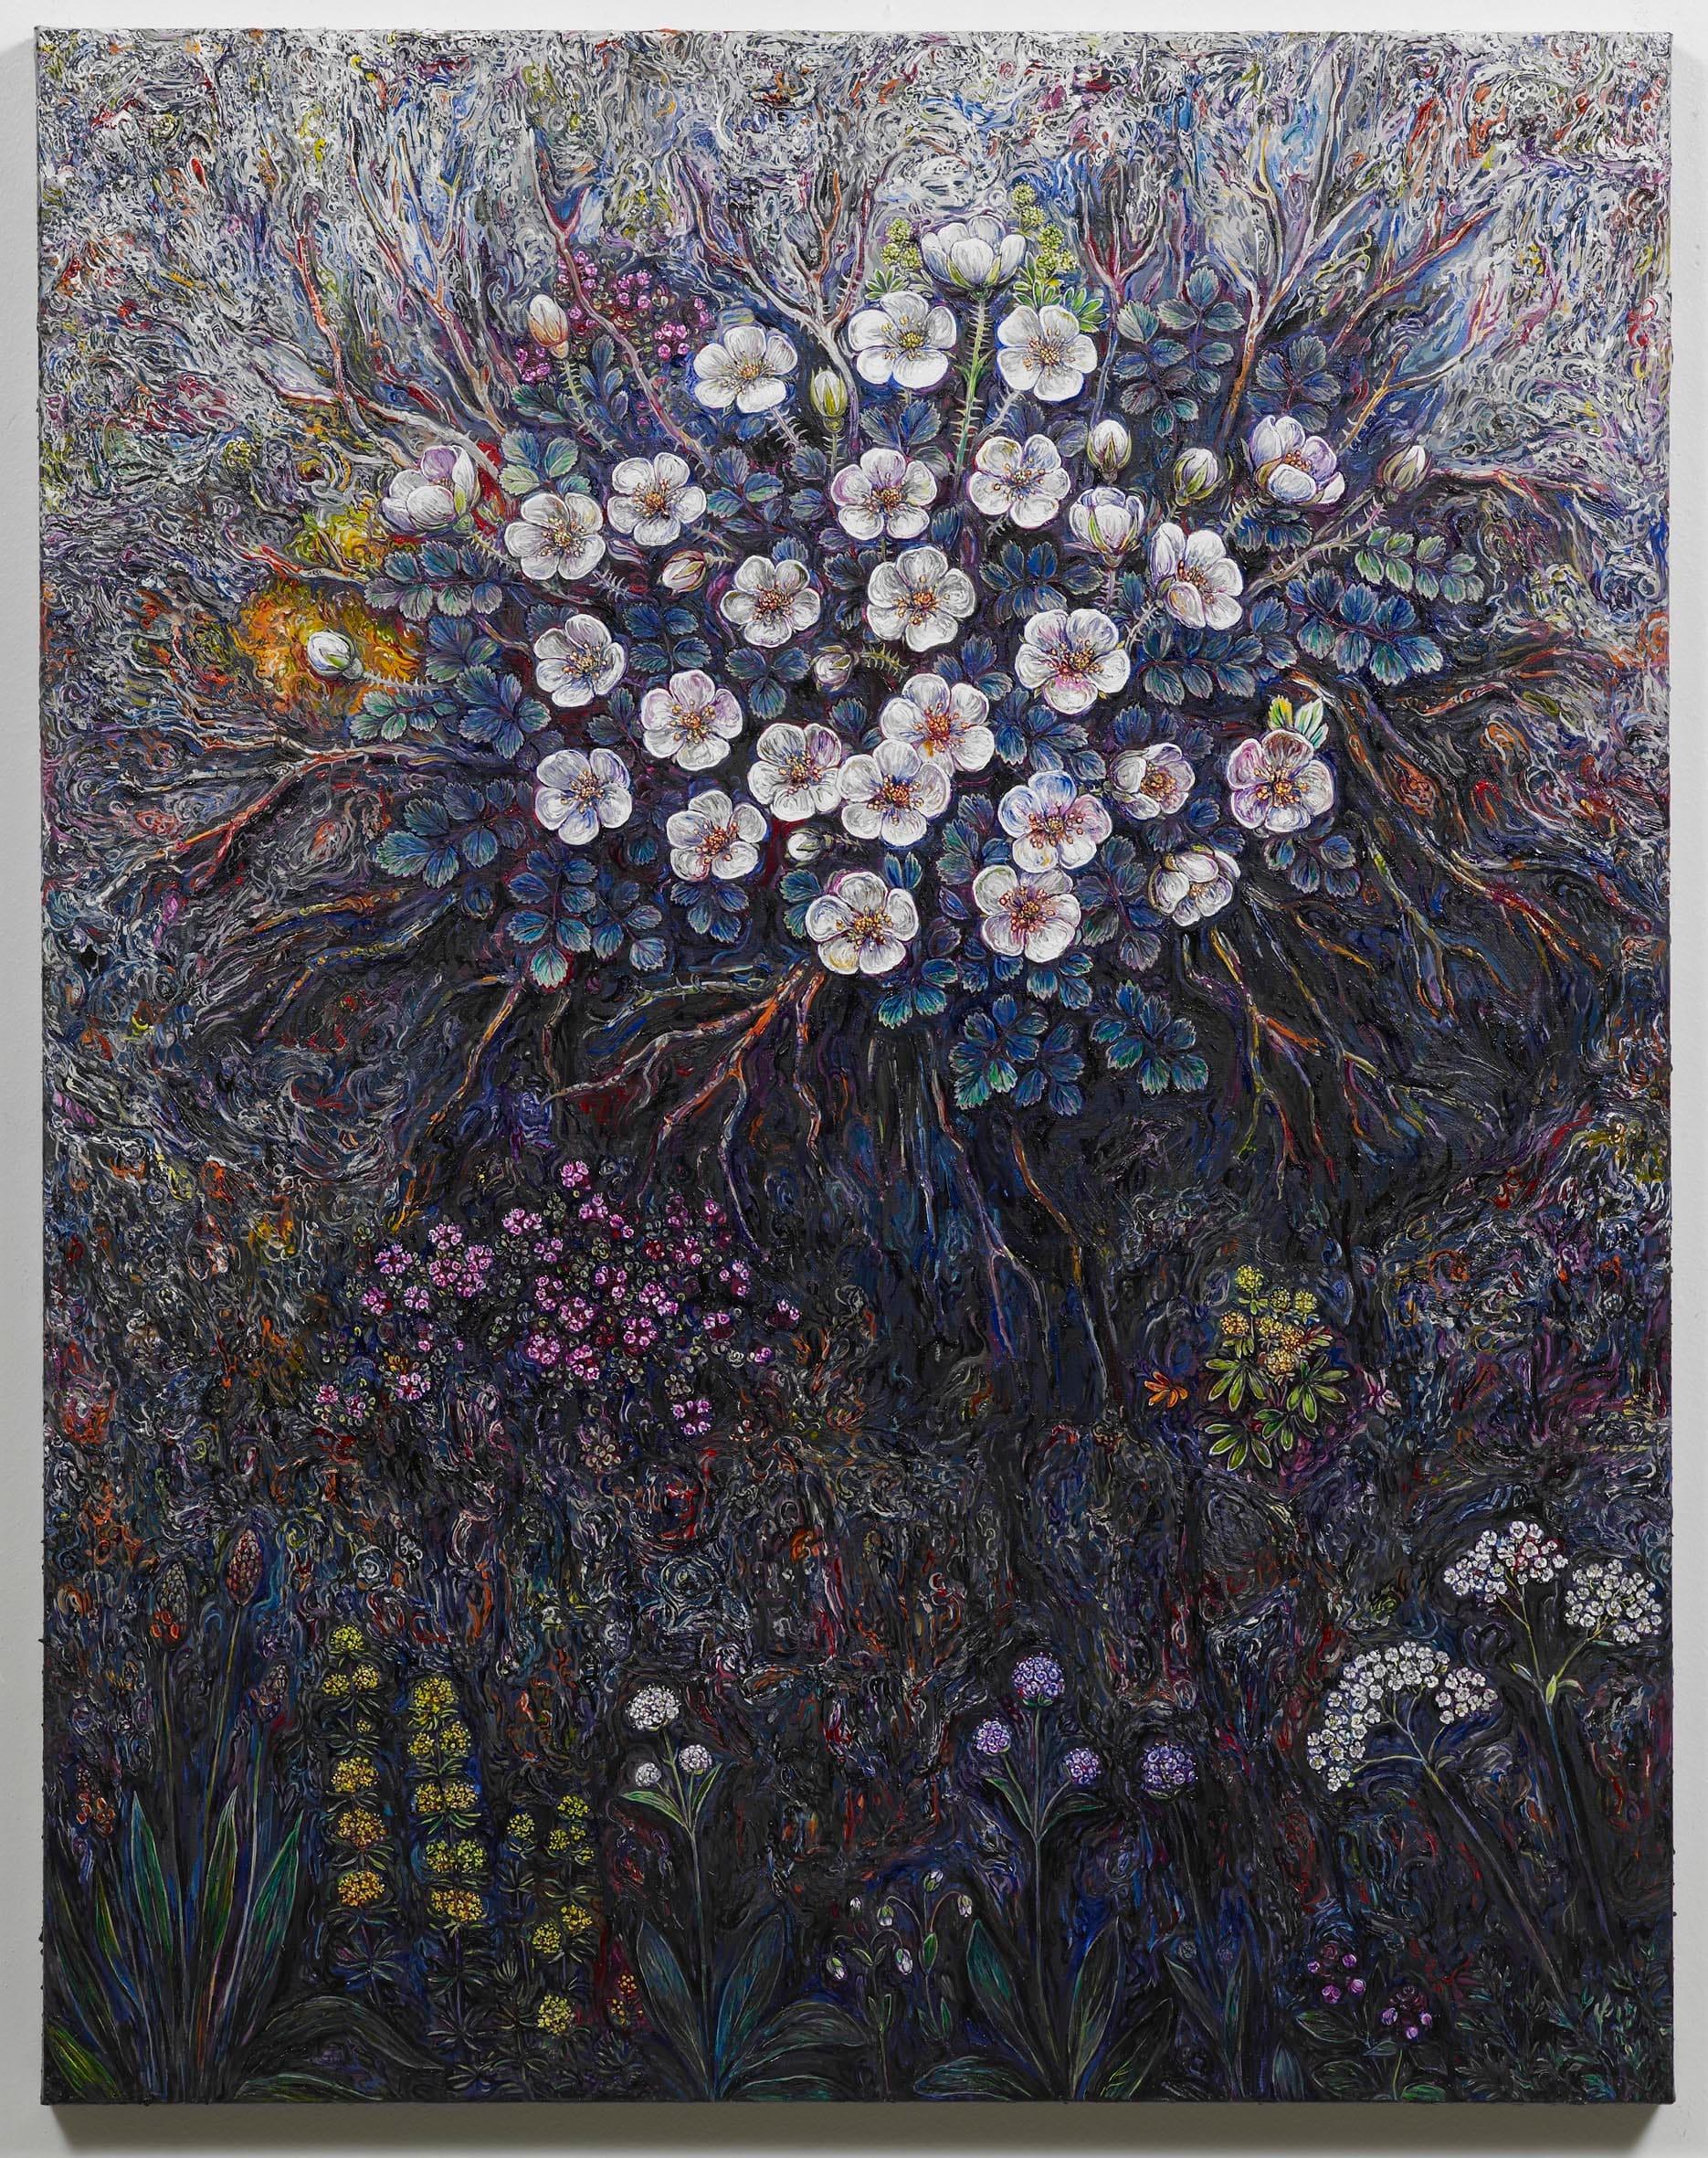 "<span class=""link fancybox-details-link""><a href=""/exhibitions/128/works/artworks8864/"">View Detail Page</a></span><div class=""artist""><strong>EGGERT PÉTURSSON</strong></div><div class=""title""><em>Untitled / Án titils (Þyrnirós í Þrasakletti)</em>, 2011-2012</div><div class=""signed_and_dated"">signed on back</div><div class=""medium"">oil on canvas / olía á striga</div><div class=""dimensions"">100.0 x 80.0 cm<br>39 1/8 x 31 3/16 in</div>"